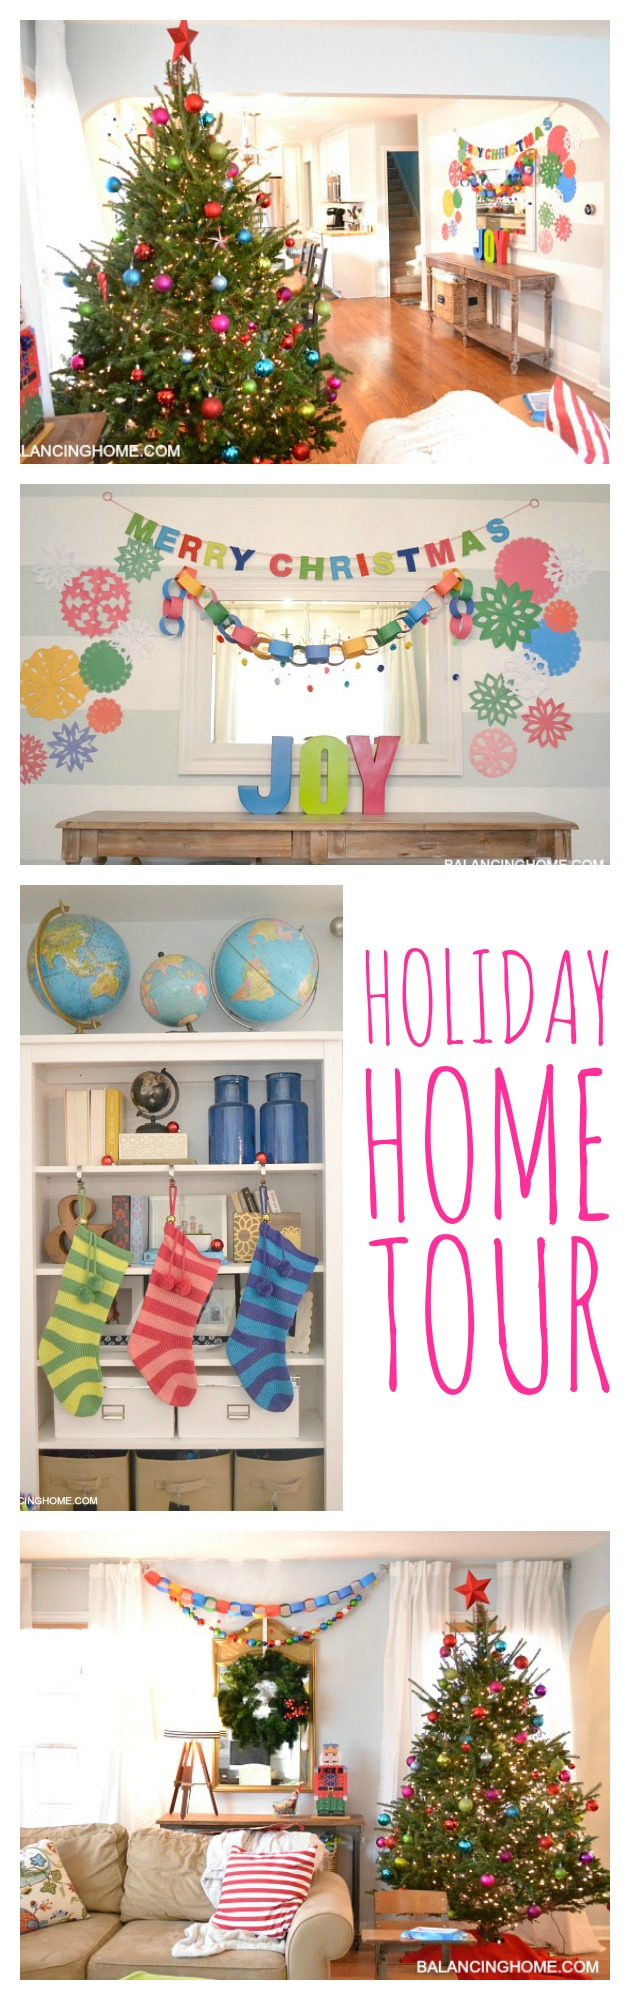 kindergarten-chic-handmade-colorful-holiday-christmas